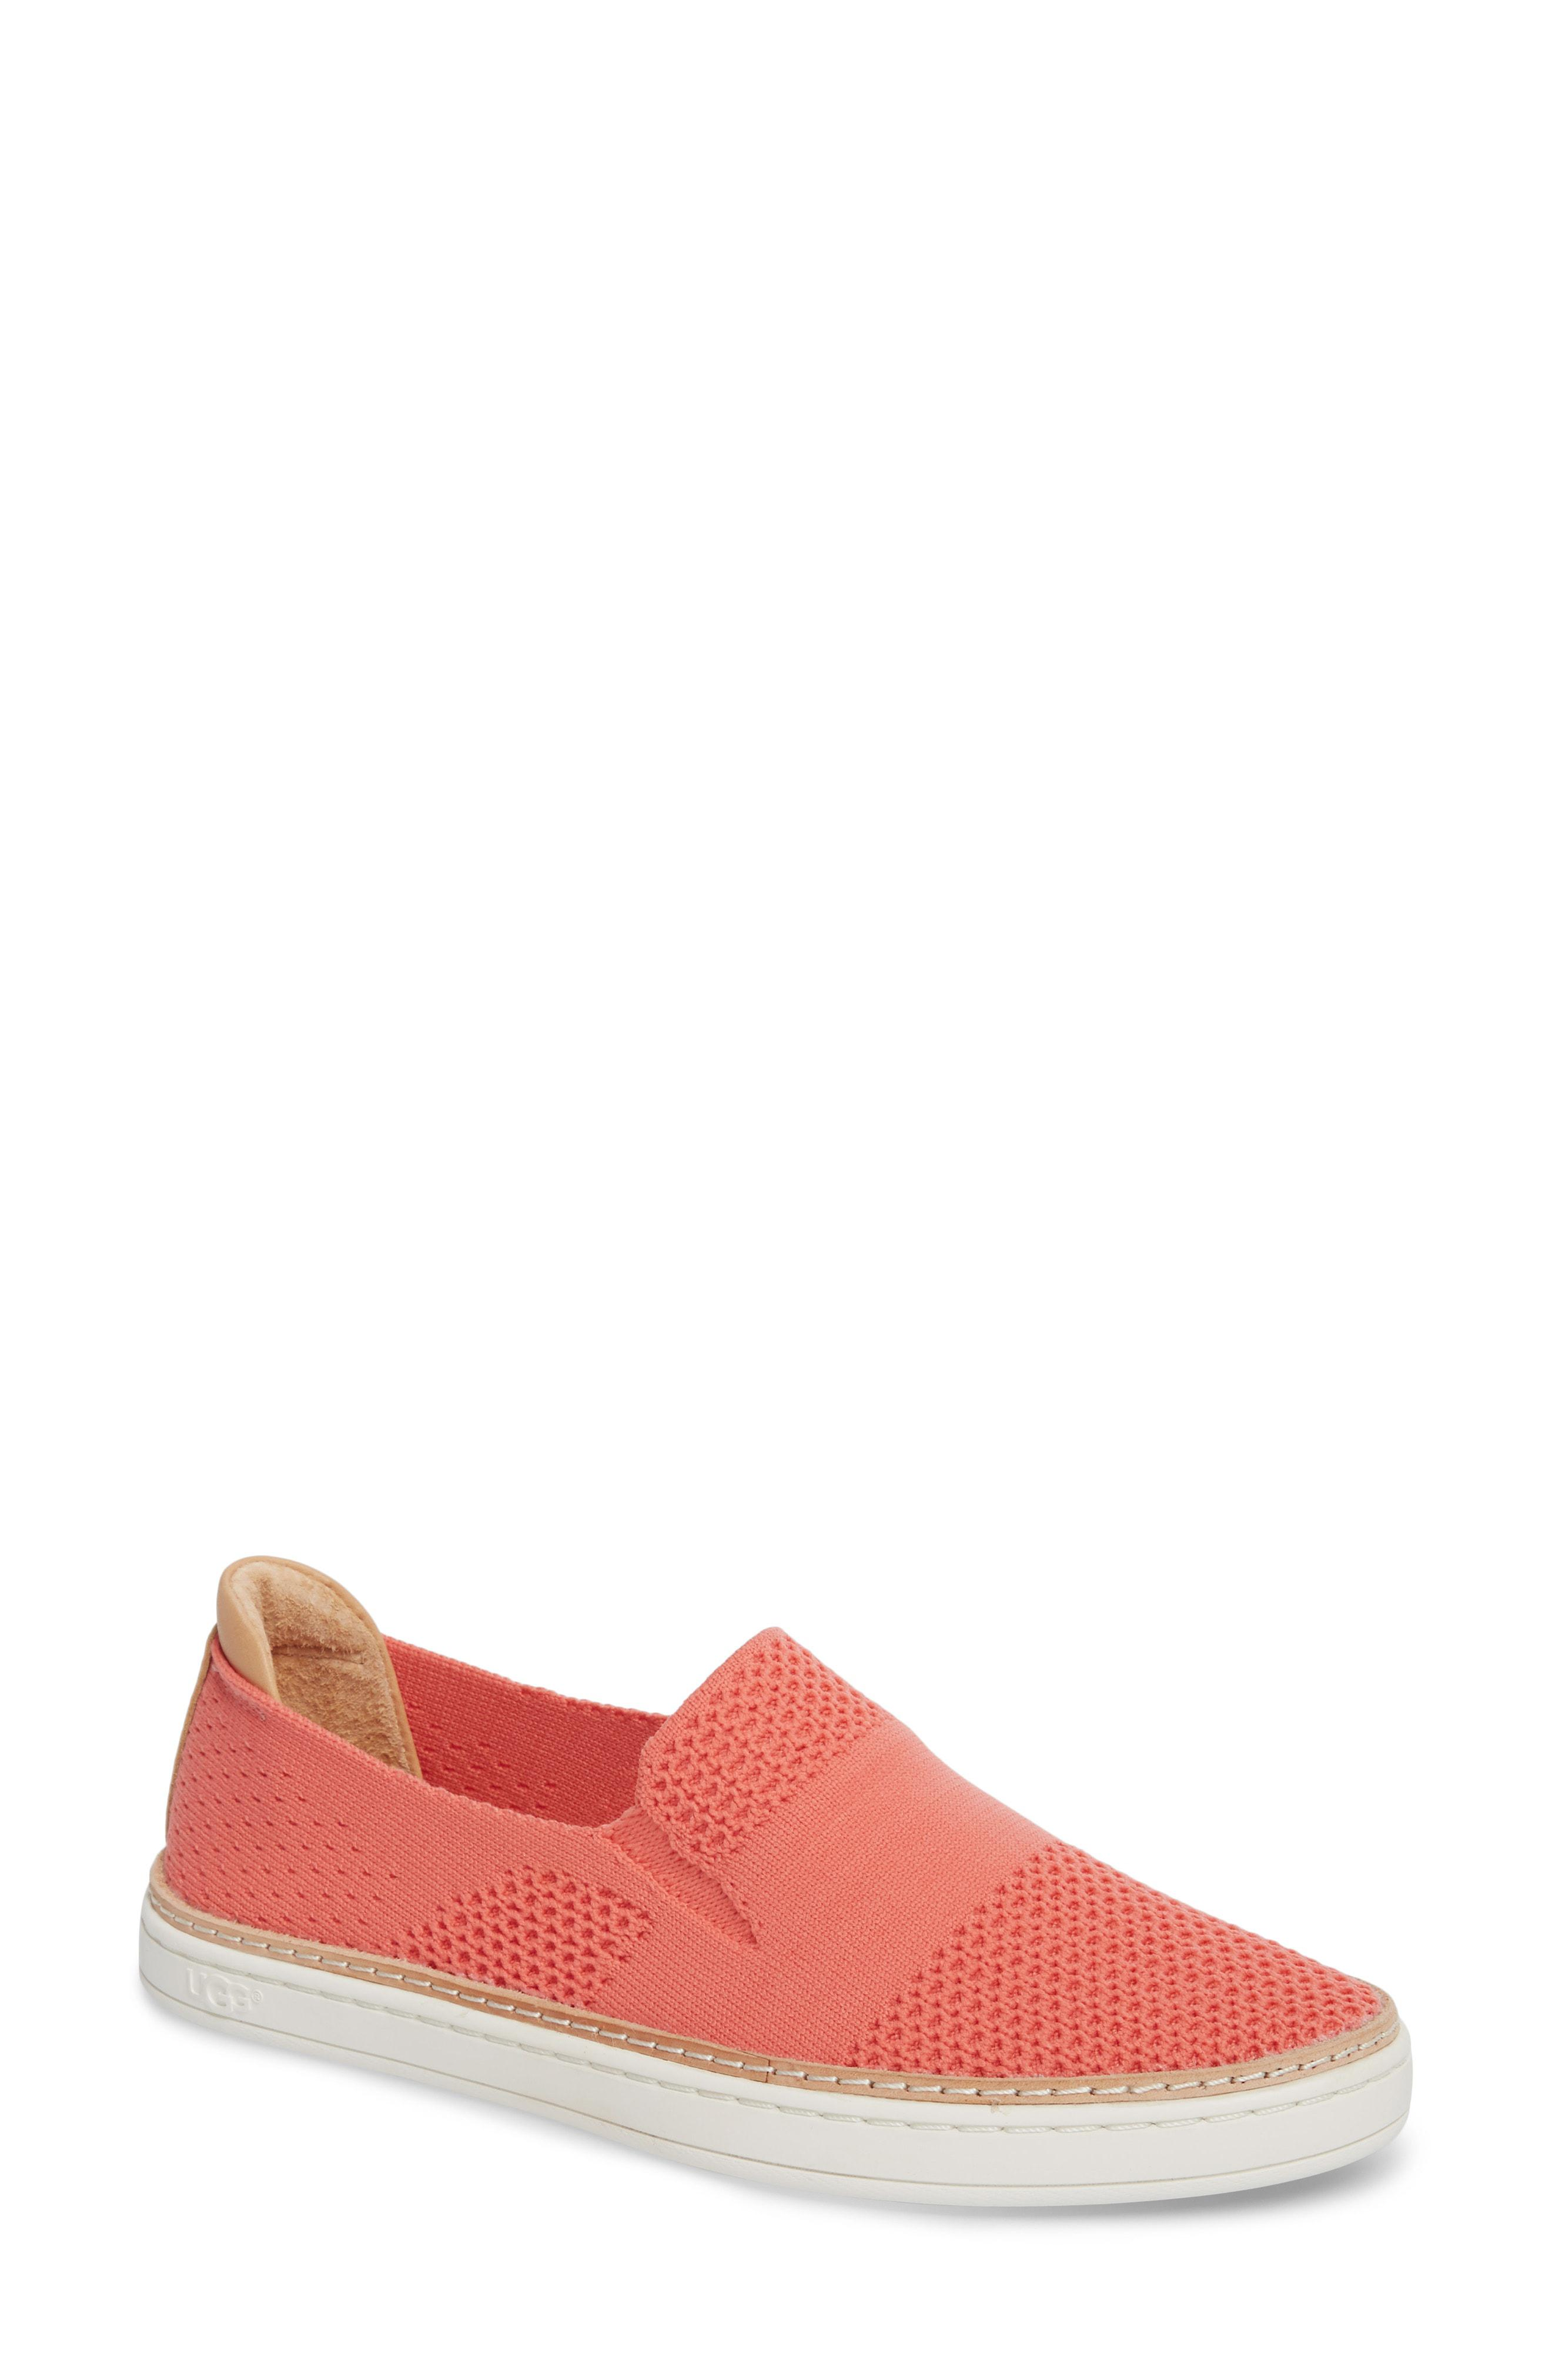 4ea784f9173 Lyst - UGG Ugg Sammy Sneaker in Pink